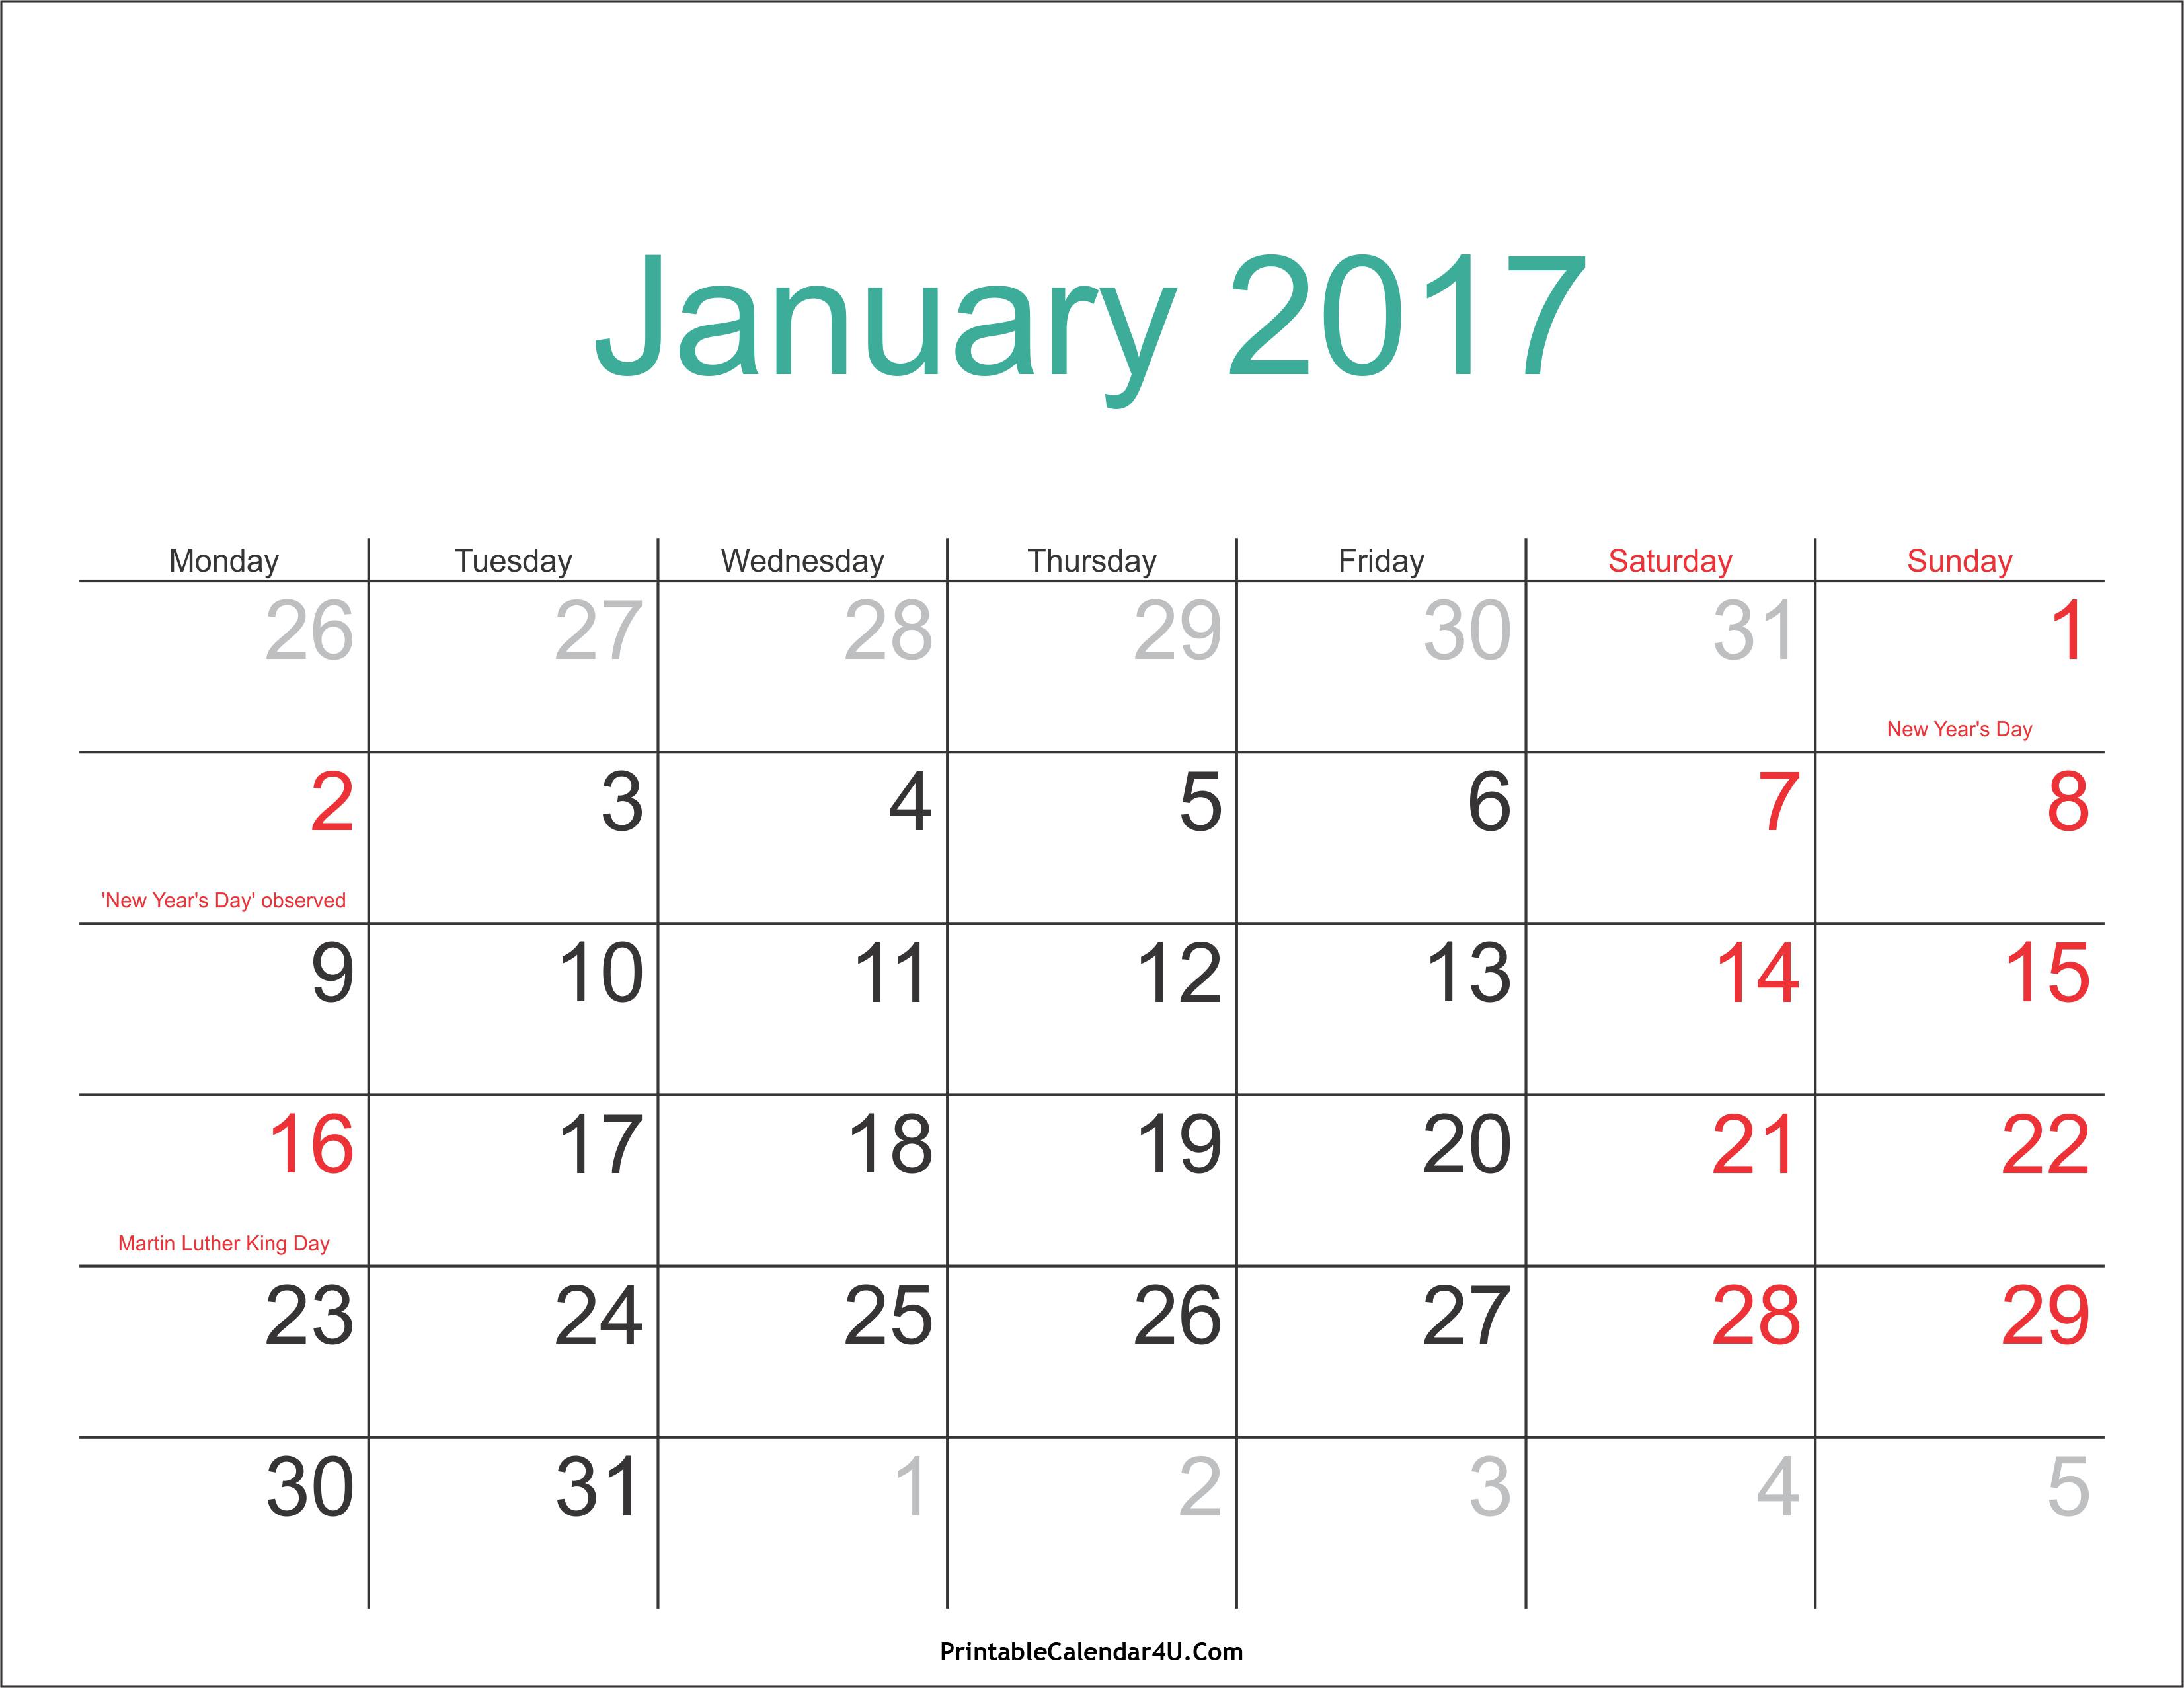 January calendar 2017 in pdf